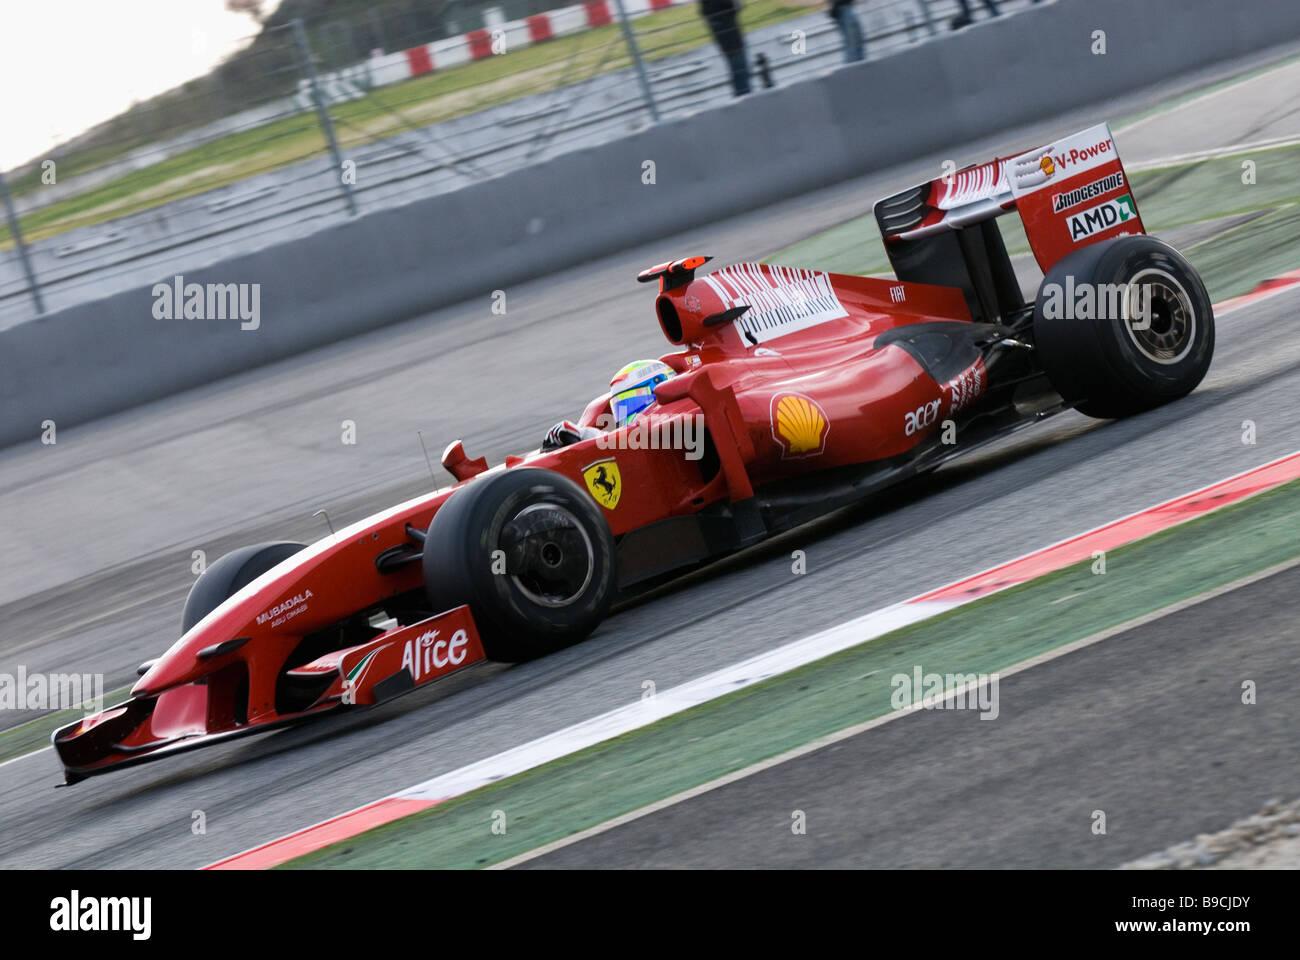 Felipe Massa Bra In The Ferrari F60 Racecar During Formula